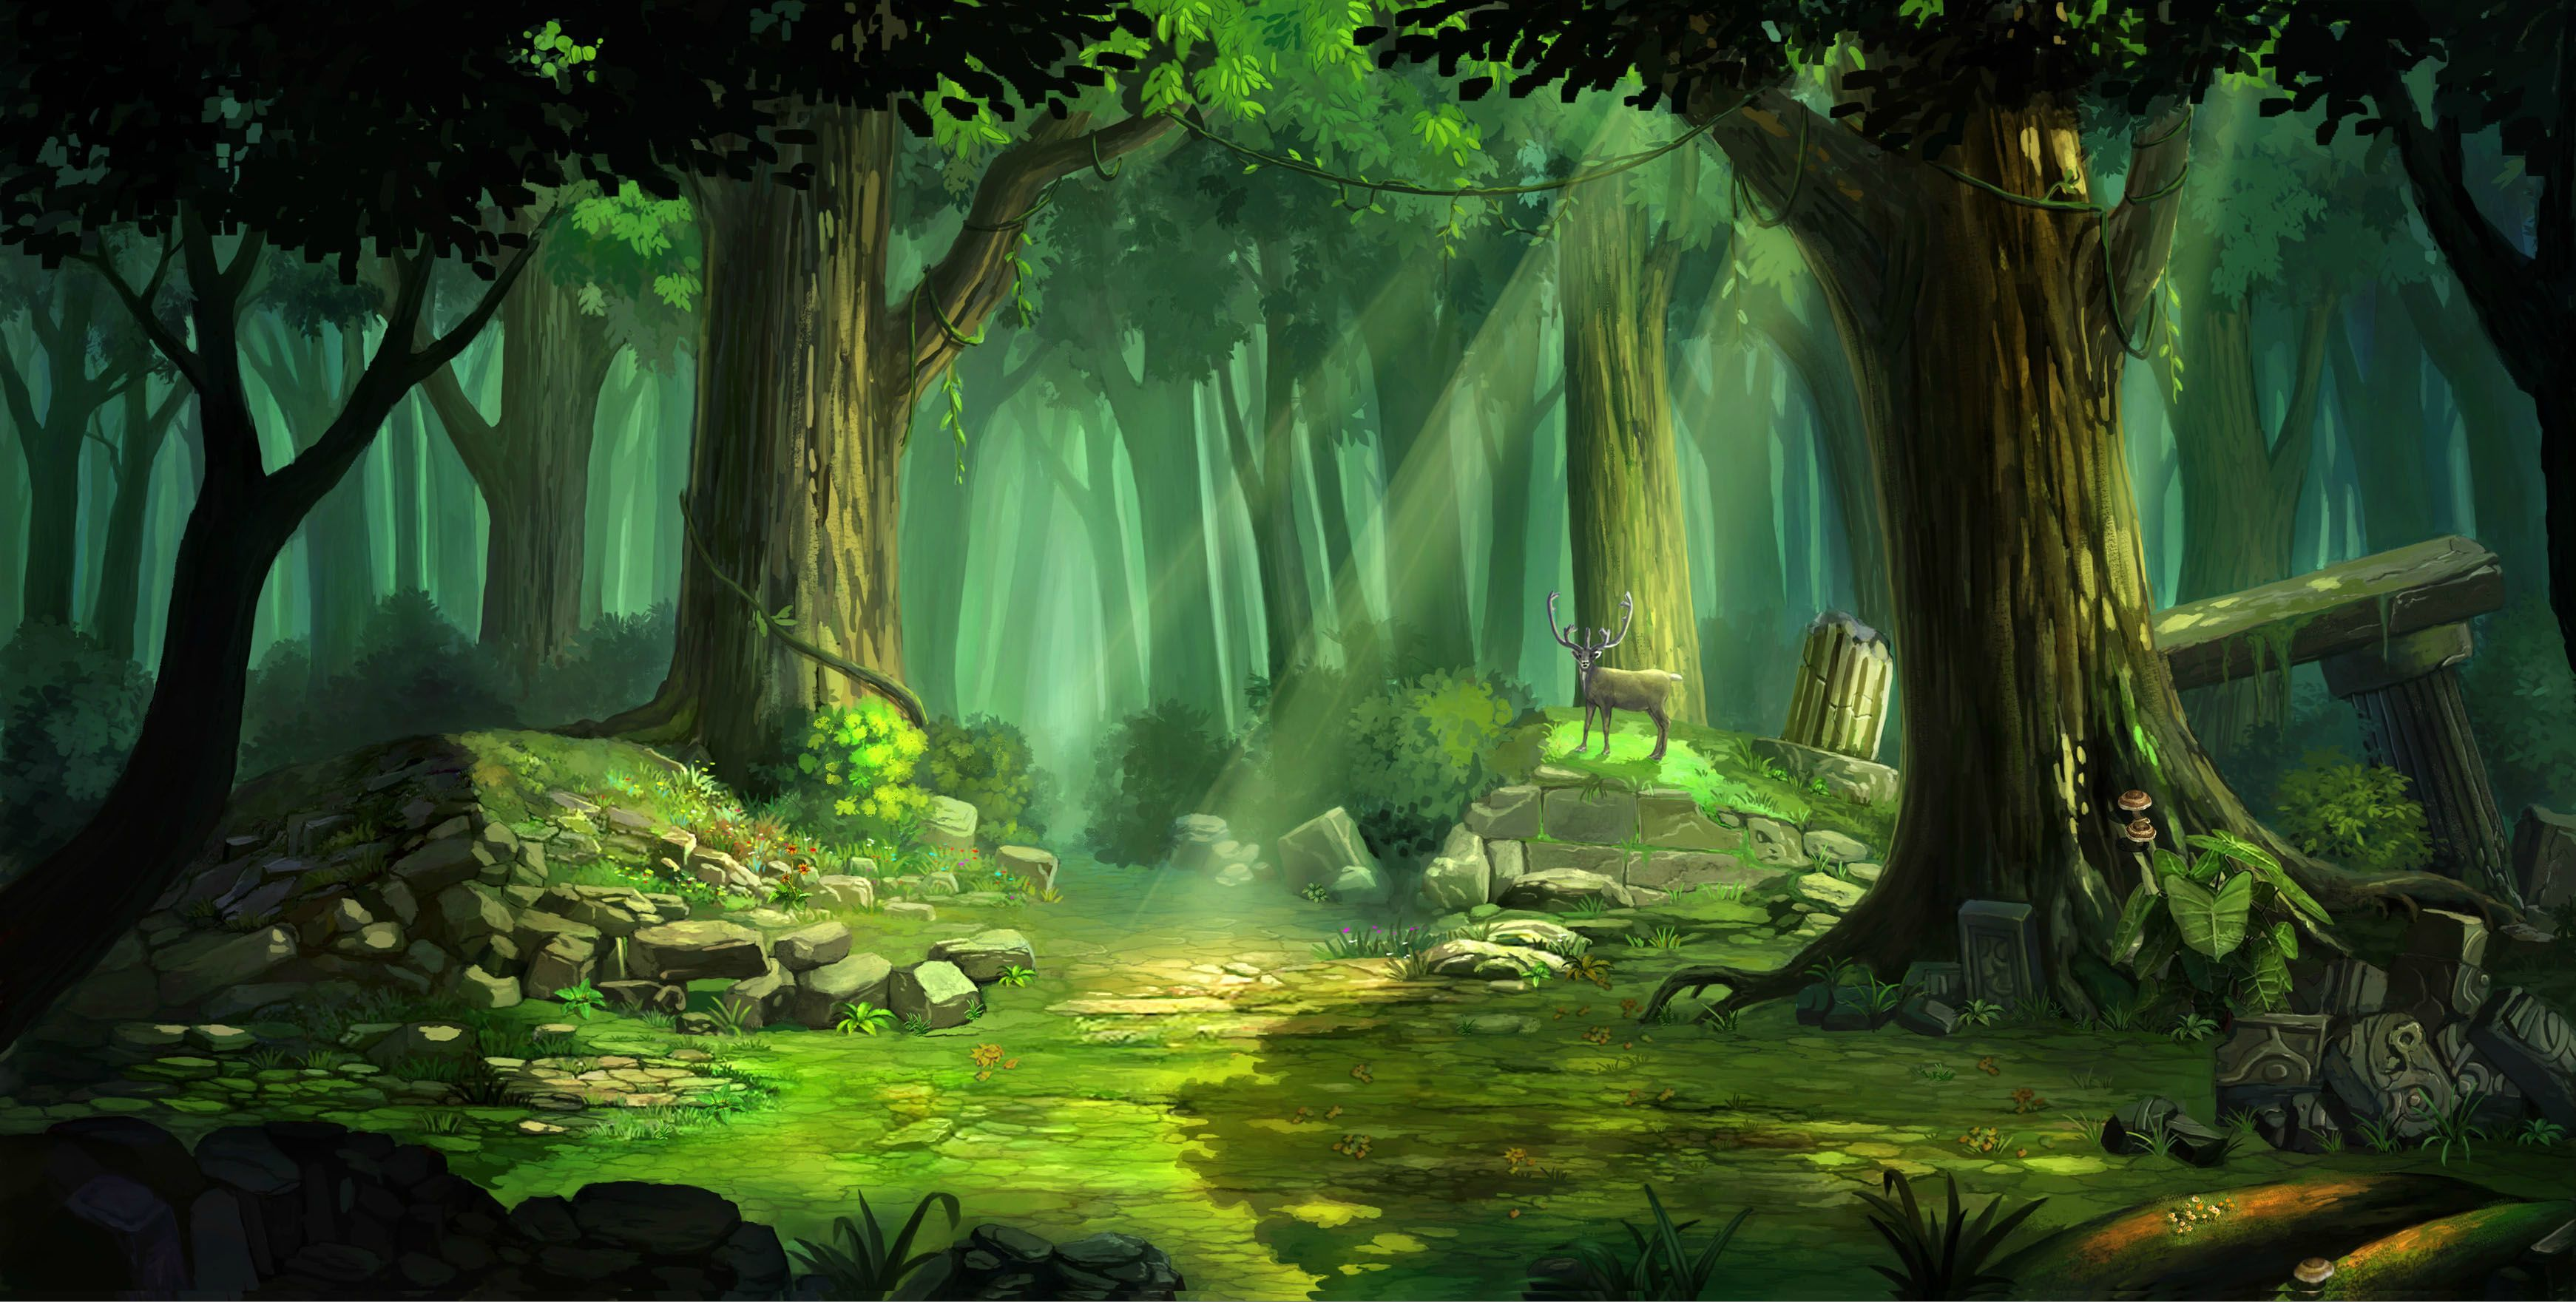 floresta anime - Pesquisa Google | desenhos | Pinterest